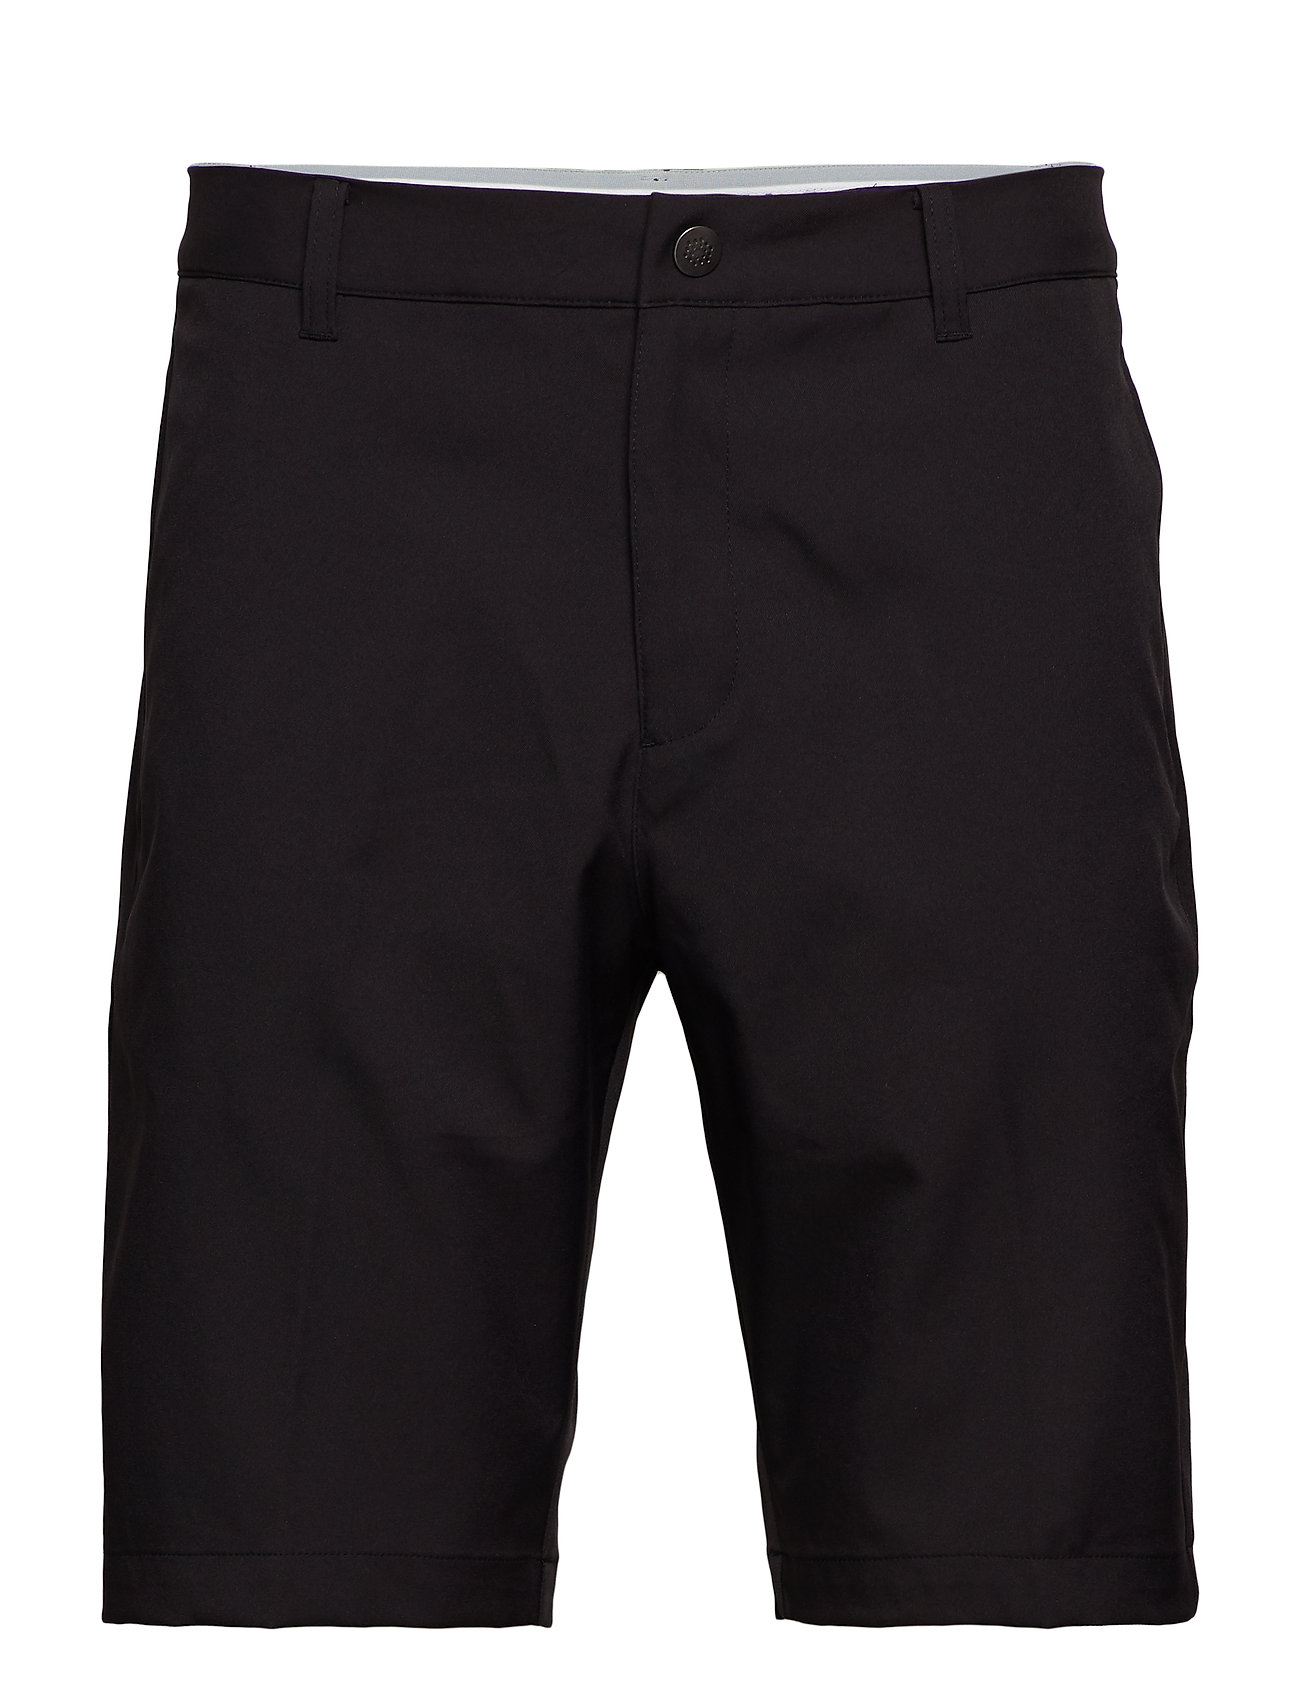 PUMA Golf Jackpot Short - PUMA BLACK